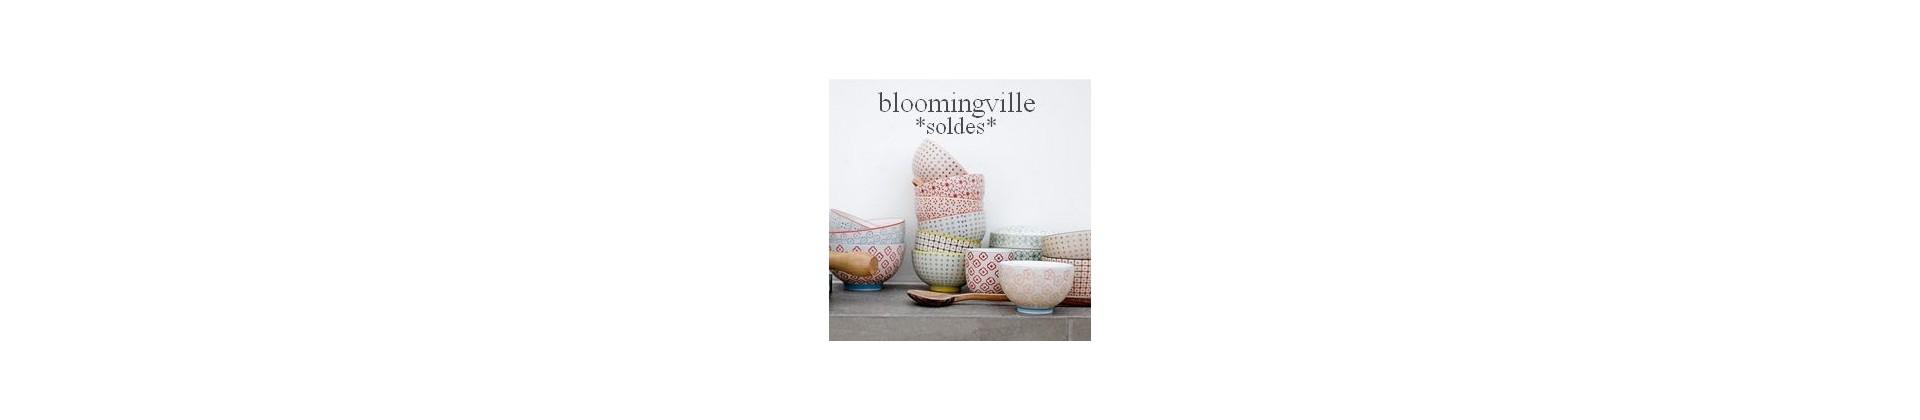 soldes bloomingville -  vaisselle scandinave, tasses, bols, pots, saladiers